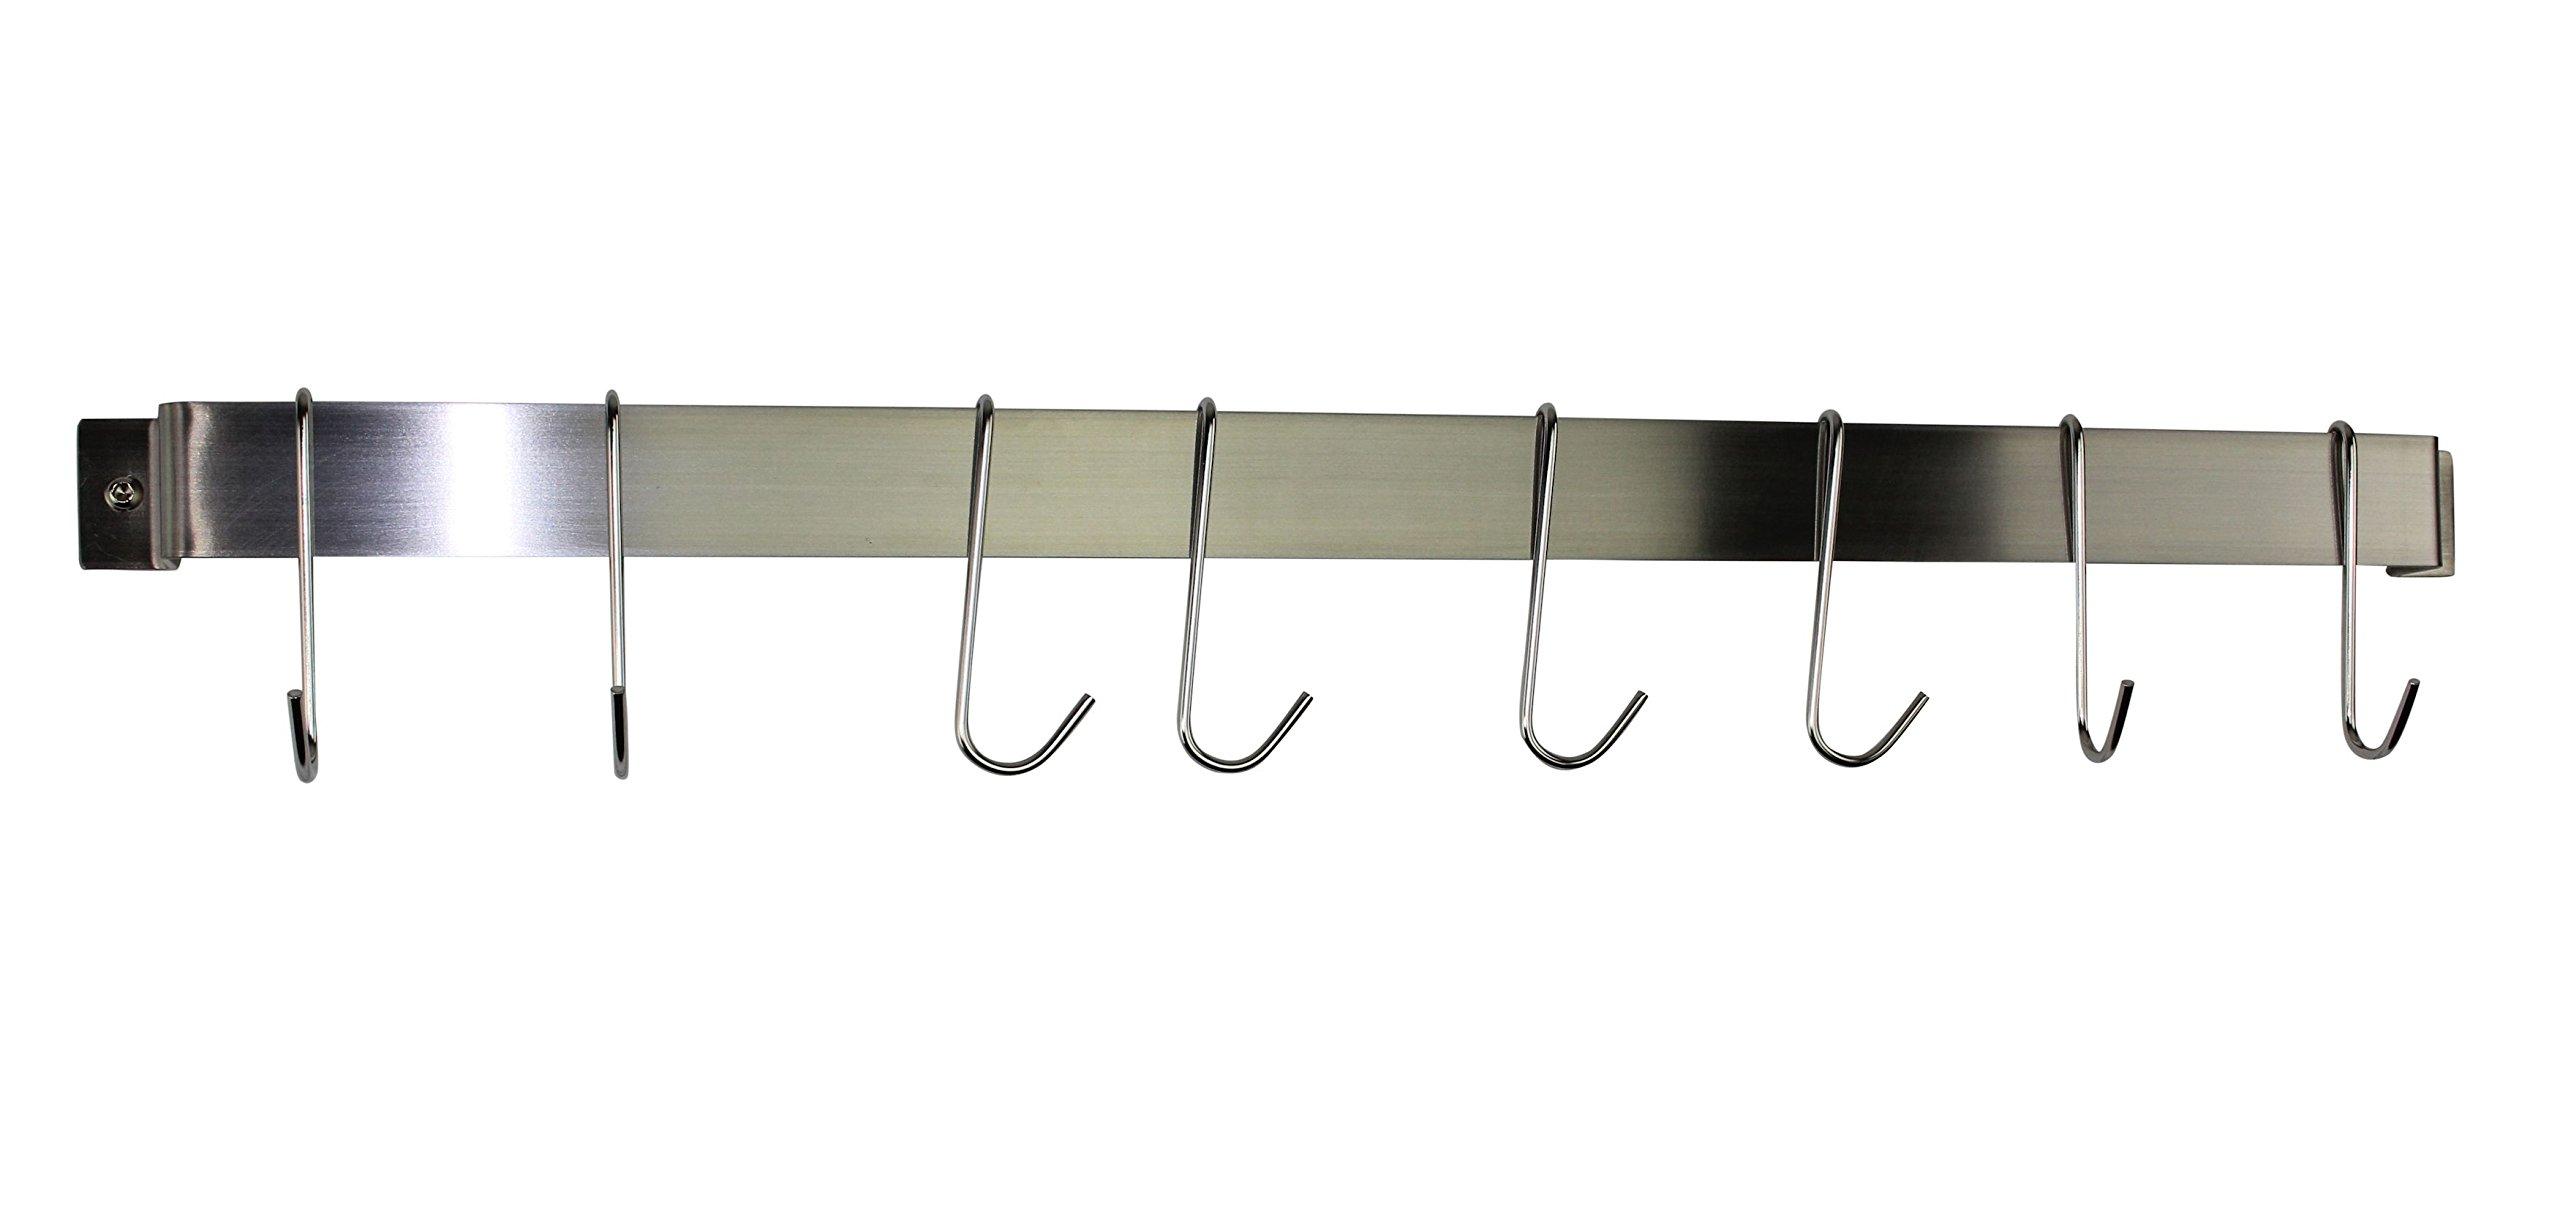 Enclume® Rack It Up NEW 32'' Easy Mount Wall Rack Utensil Bar w 8 Hooks Stainless Steel